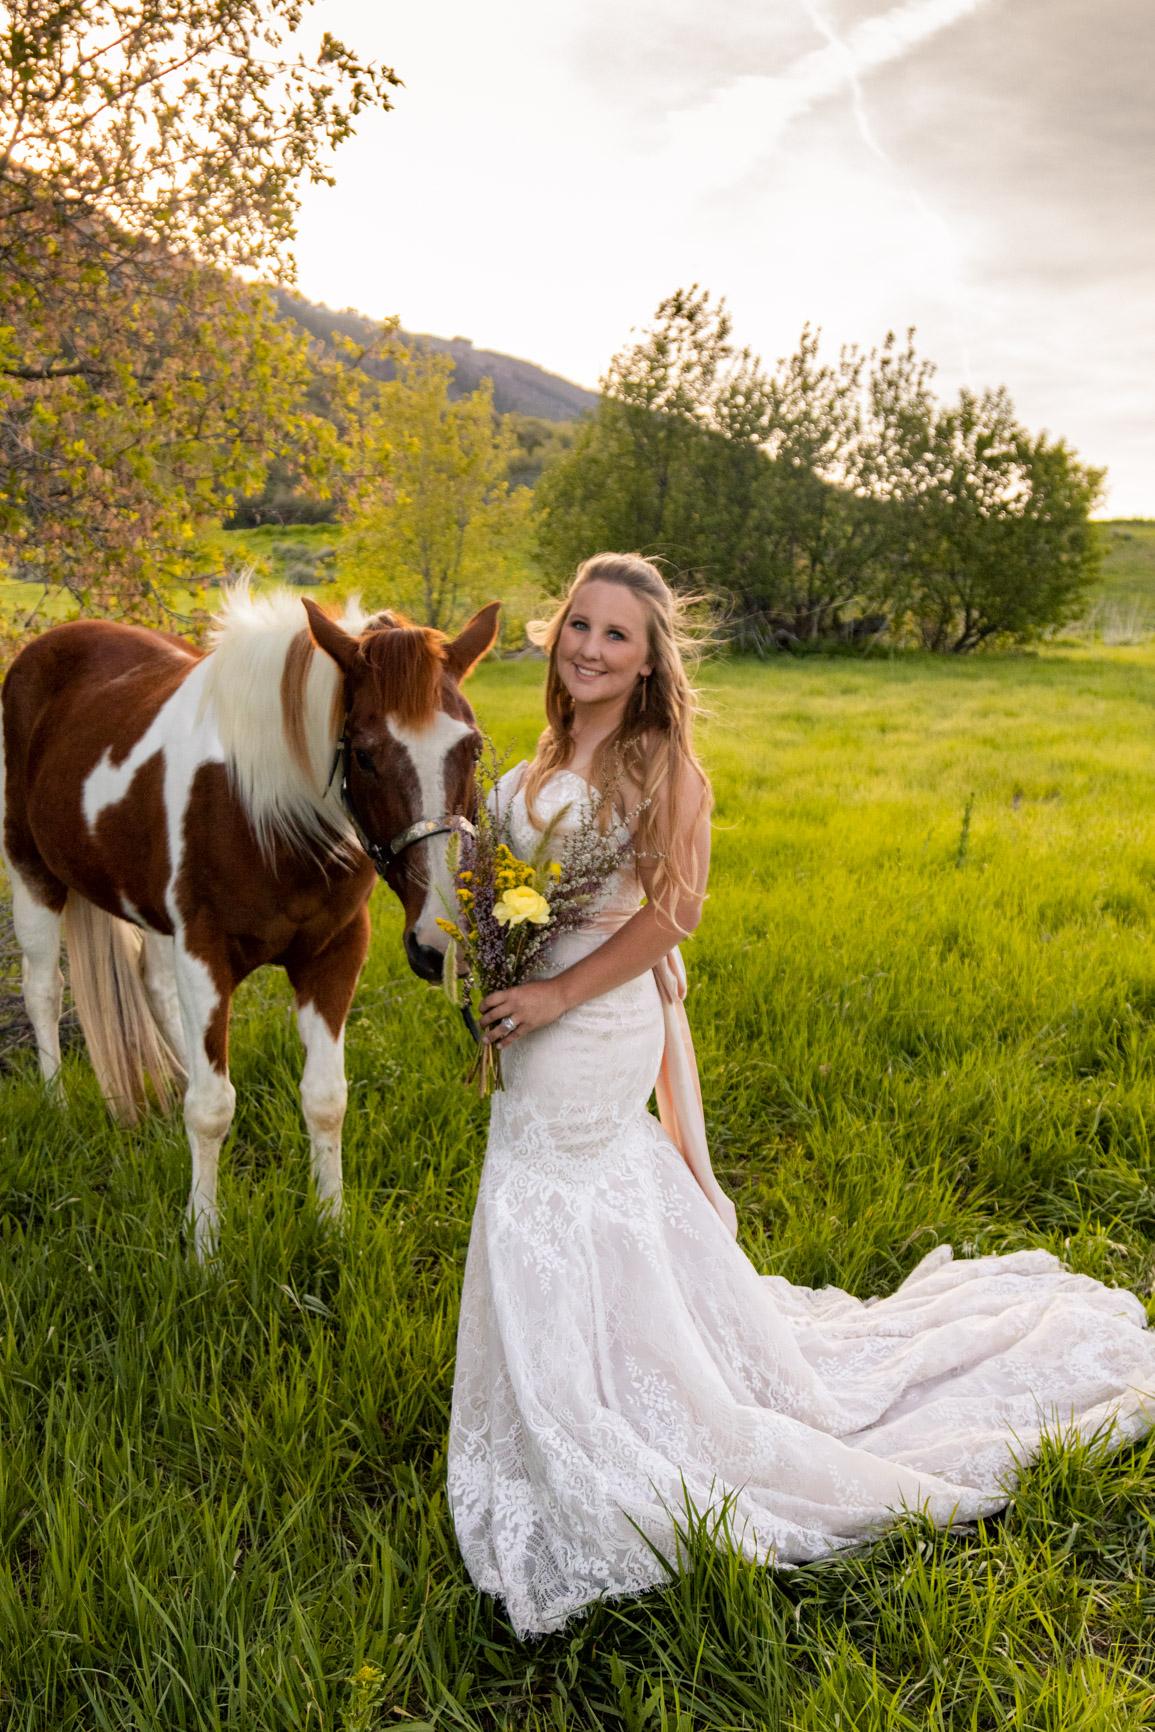 Rustic Wild Wedding Bouquet Elopement Rocky Mountains Wasatch Mountains Utah Halie West Photography 1